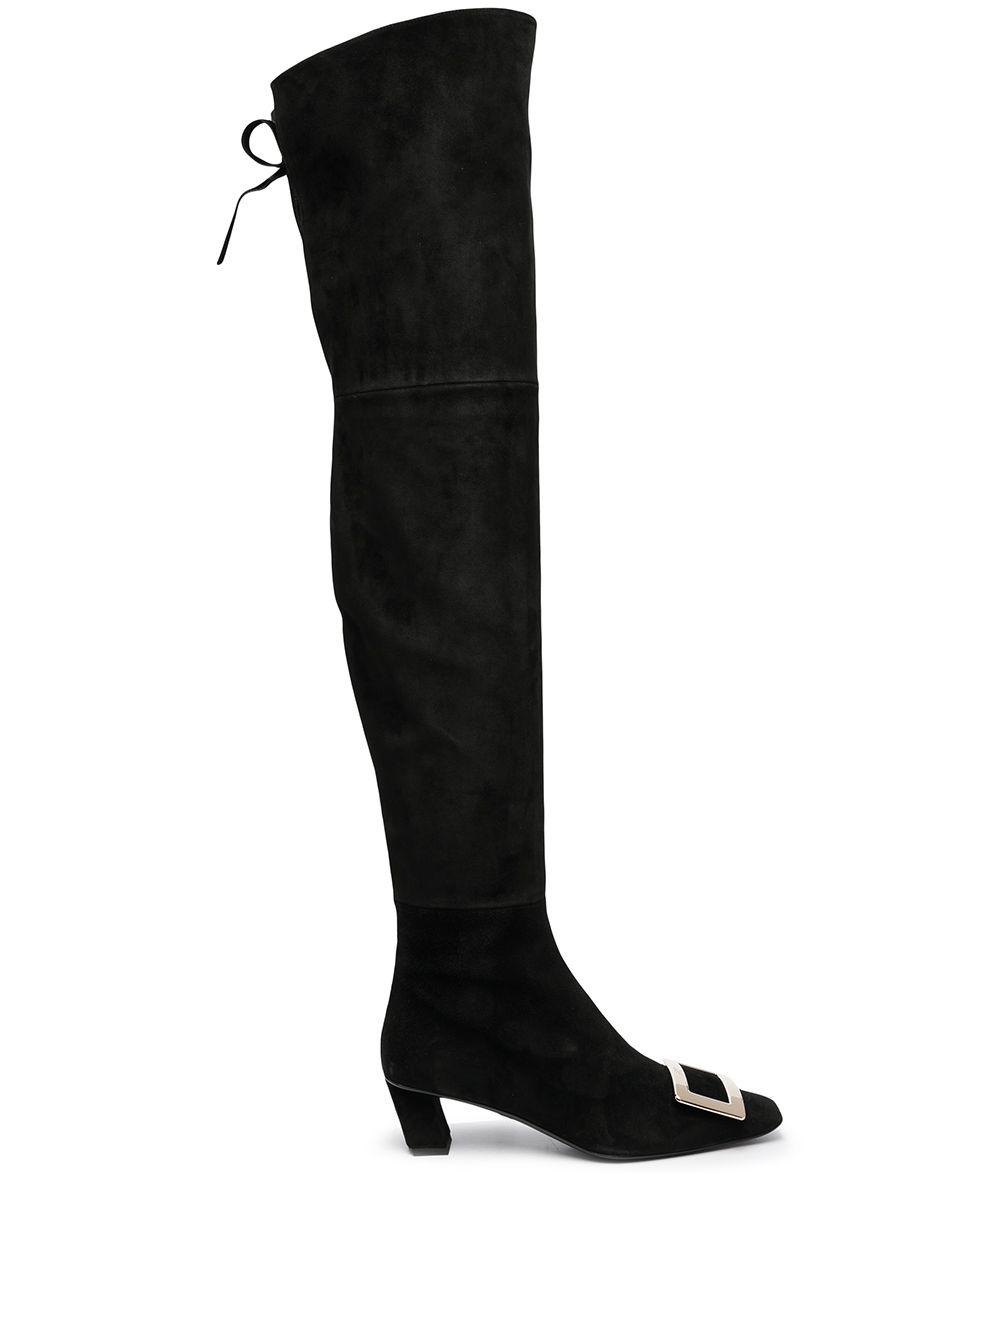 Belle Vivier Leather Boots